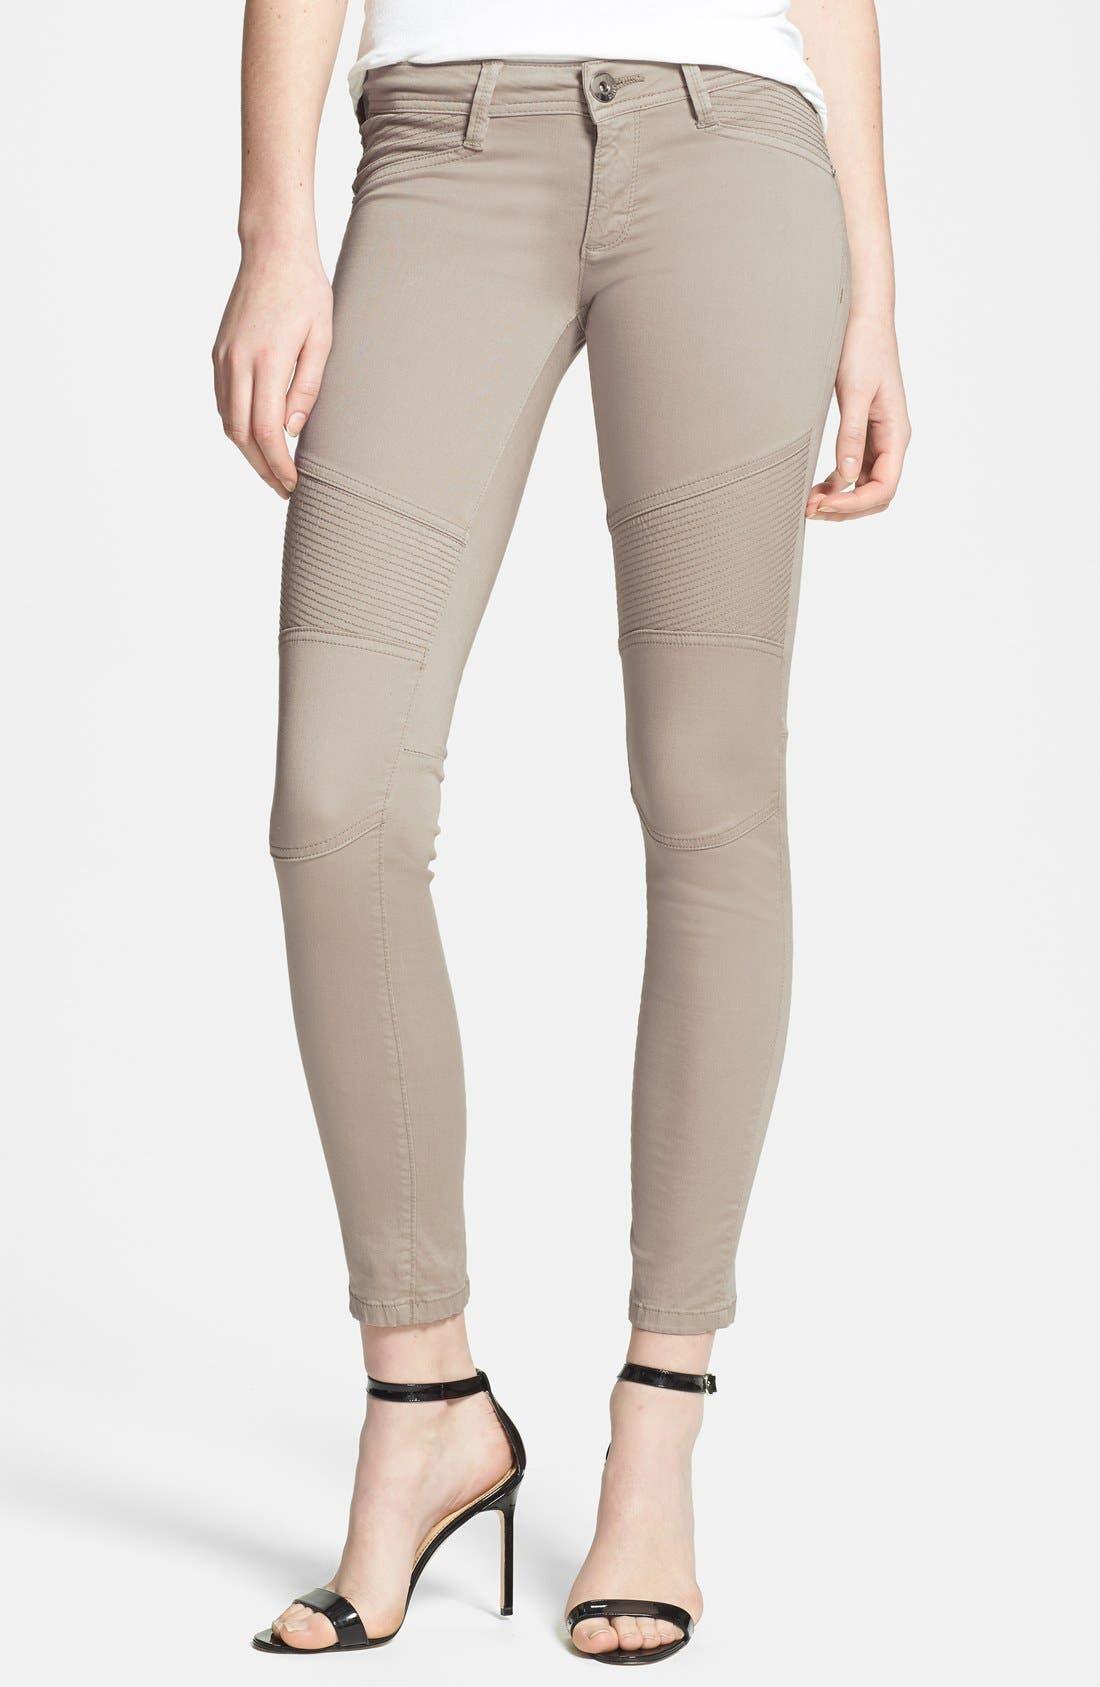 Alternate Image 1 Selected - DL1961 'Harlow' Moto Crop Skinny Jeans (Morton)